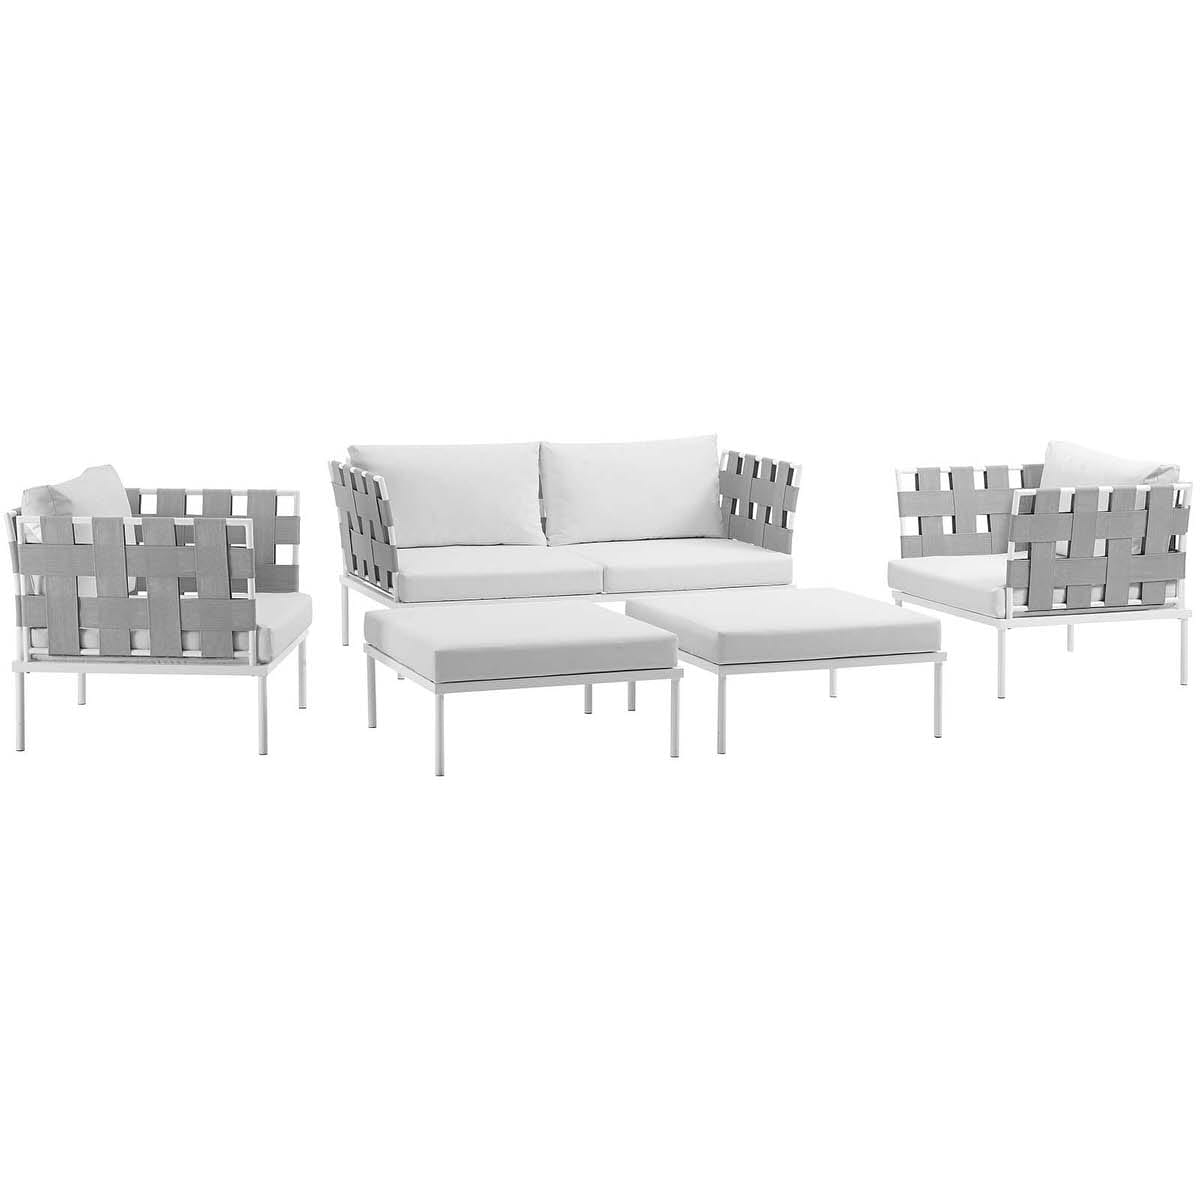 Harmony 5 Piece Outdoor Patio Aluminum Sectional Sofa Set White ...